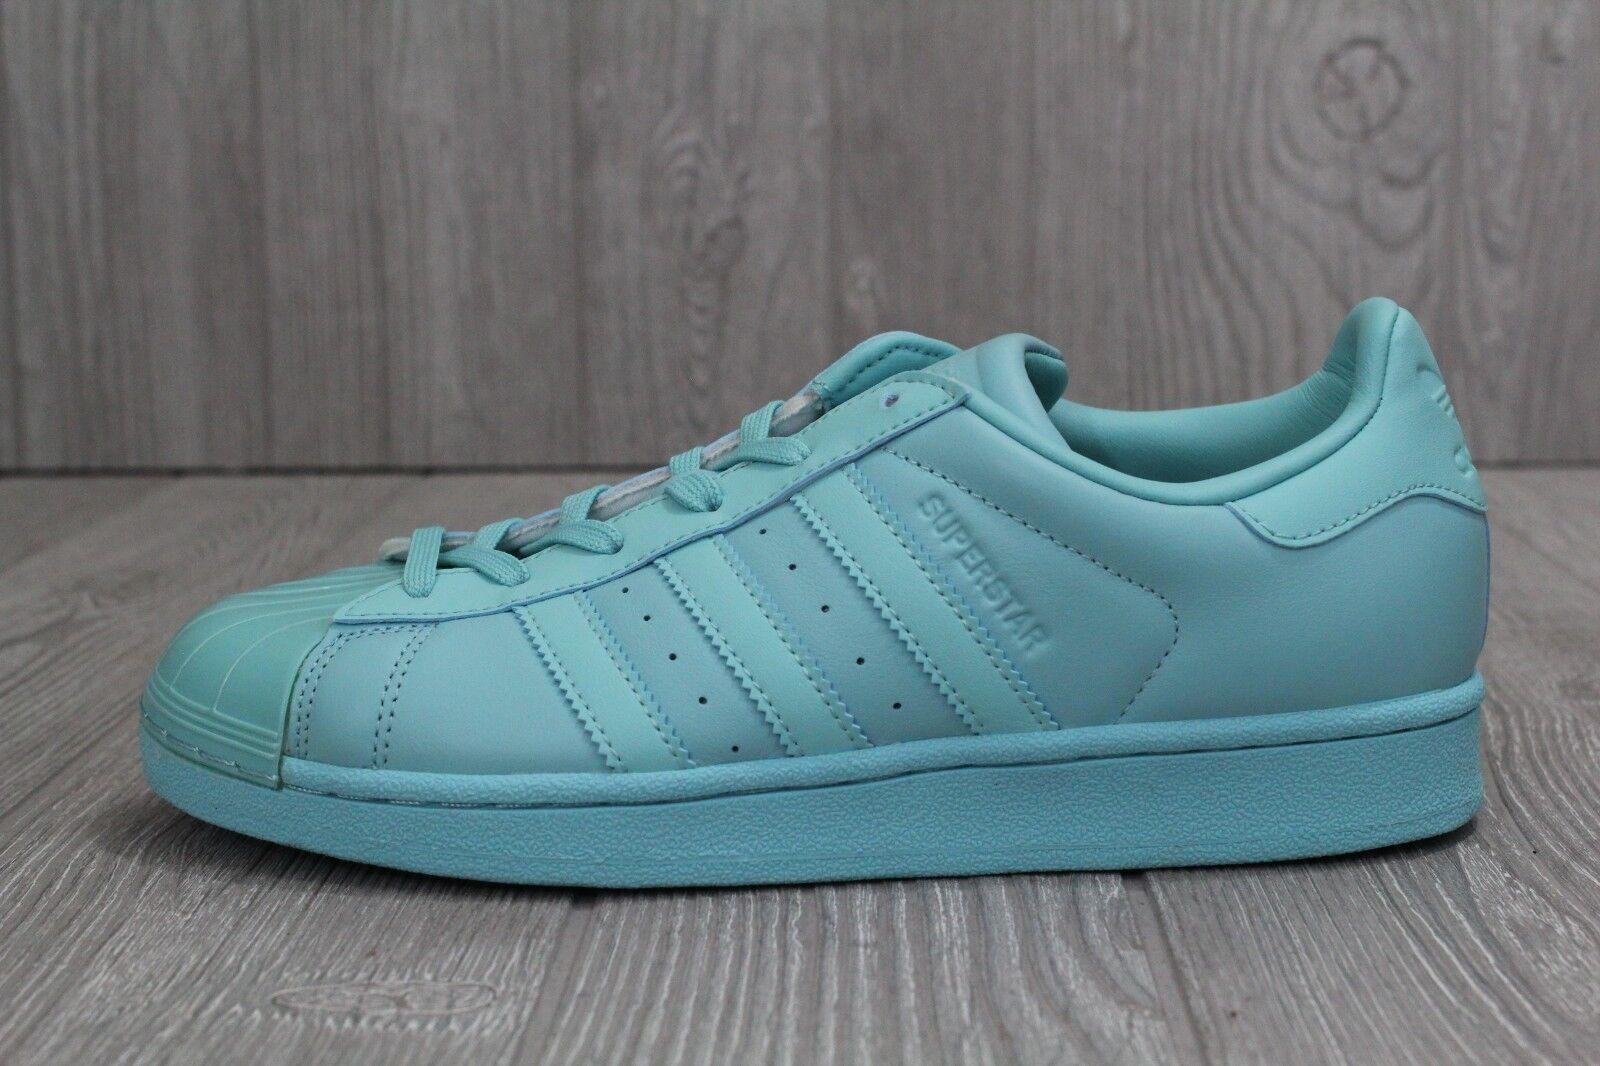 30 New Adidas Originals Superstar Glossy Toe Women's Mint shoes BB0529 7 8 10